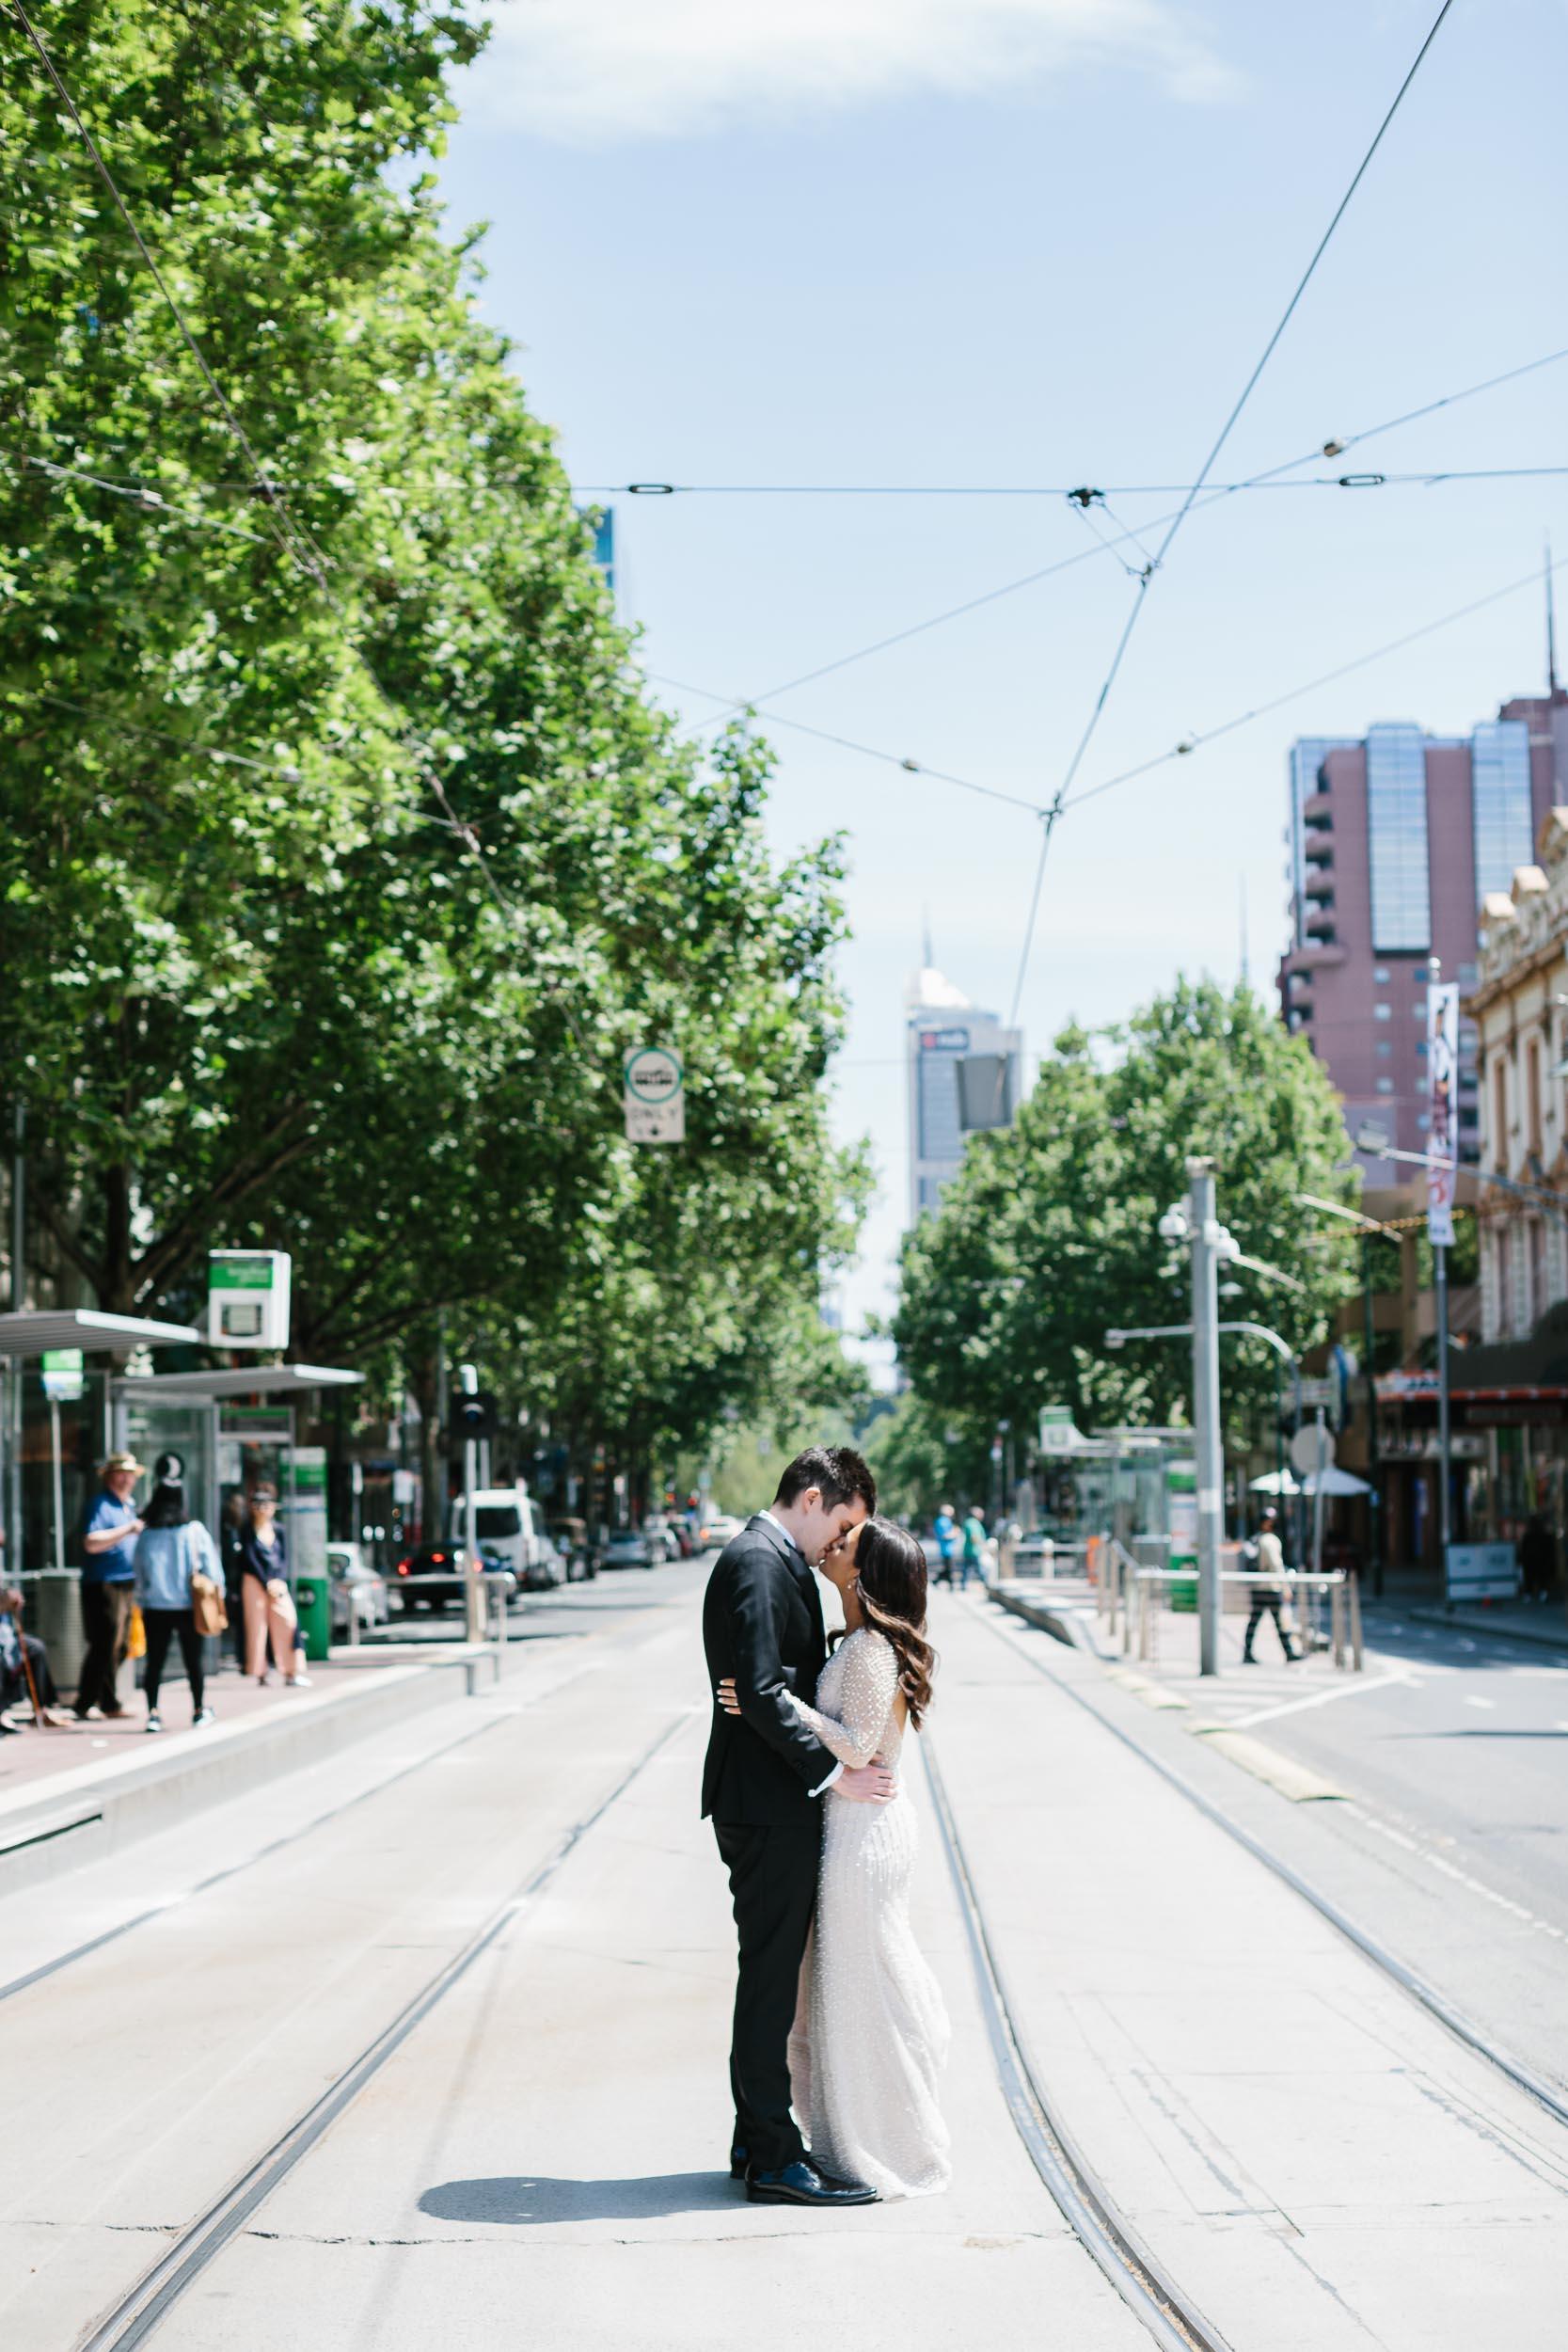 Kas-Richards-Wedding-Photographer-Melbourne-City-Wedding-Alto-Event-Space-Jane-Hill-Bridal-Gown-13.jpg